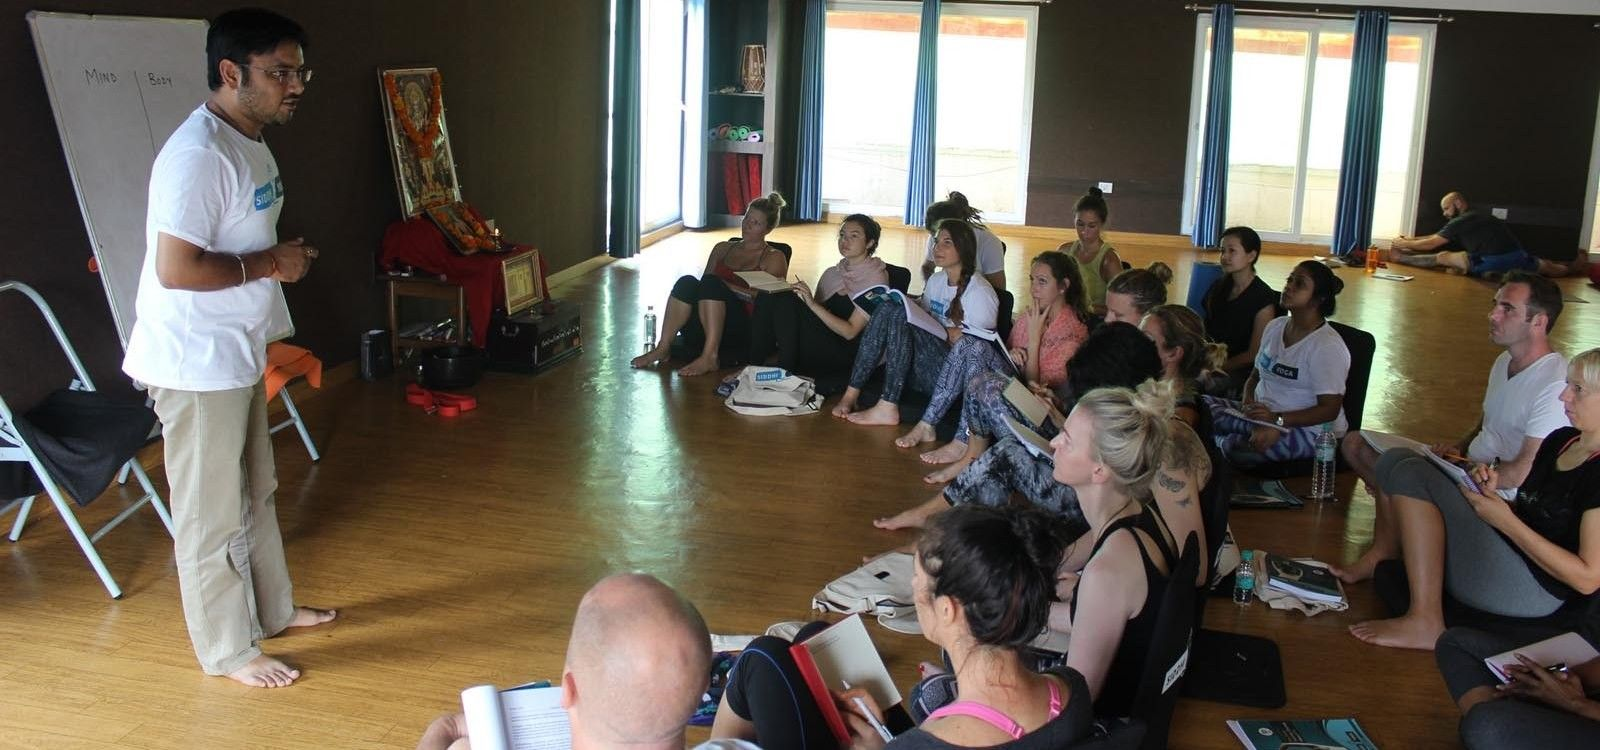 indian yoga teacher dr. sumit